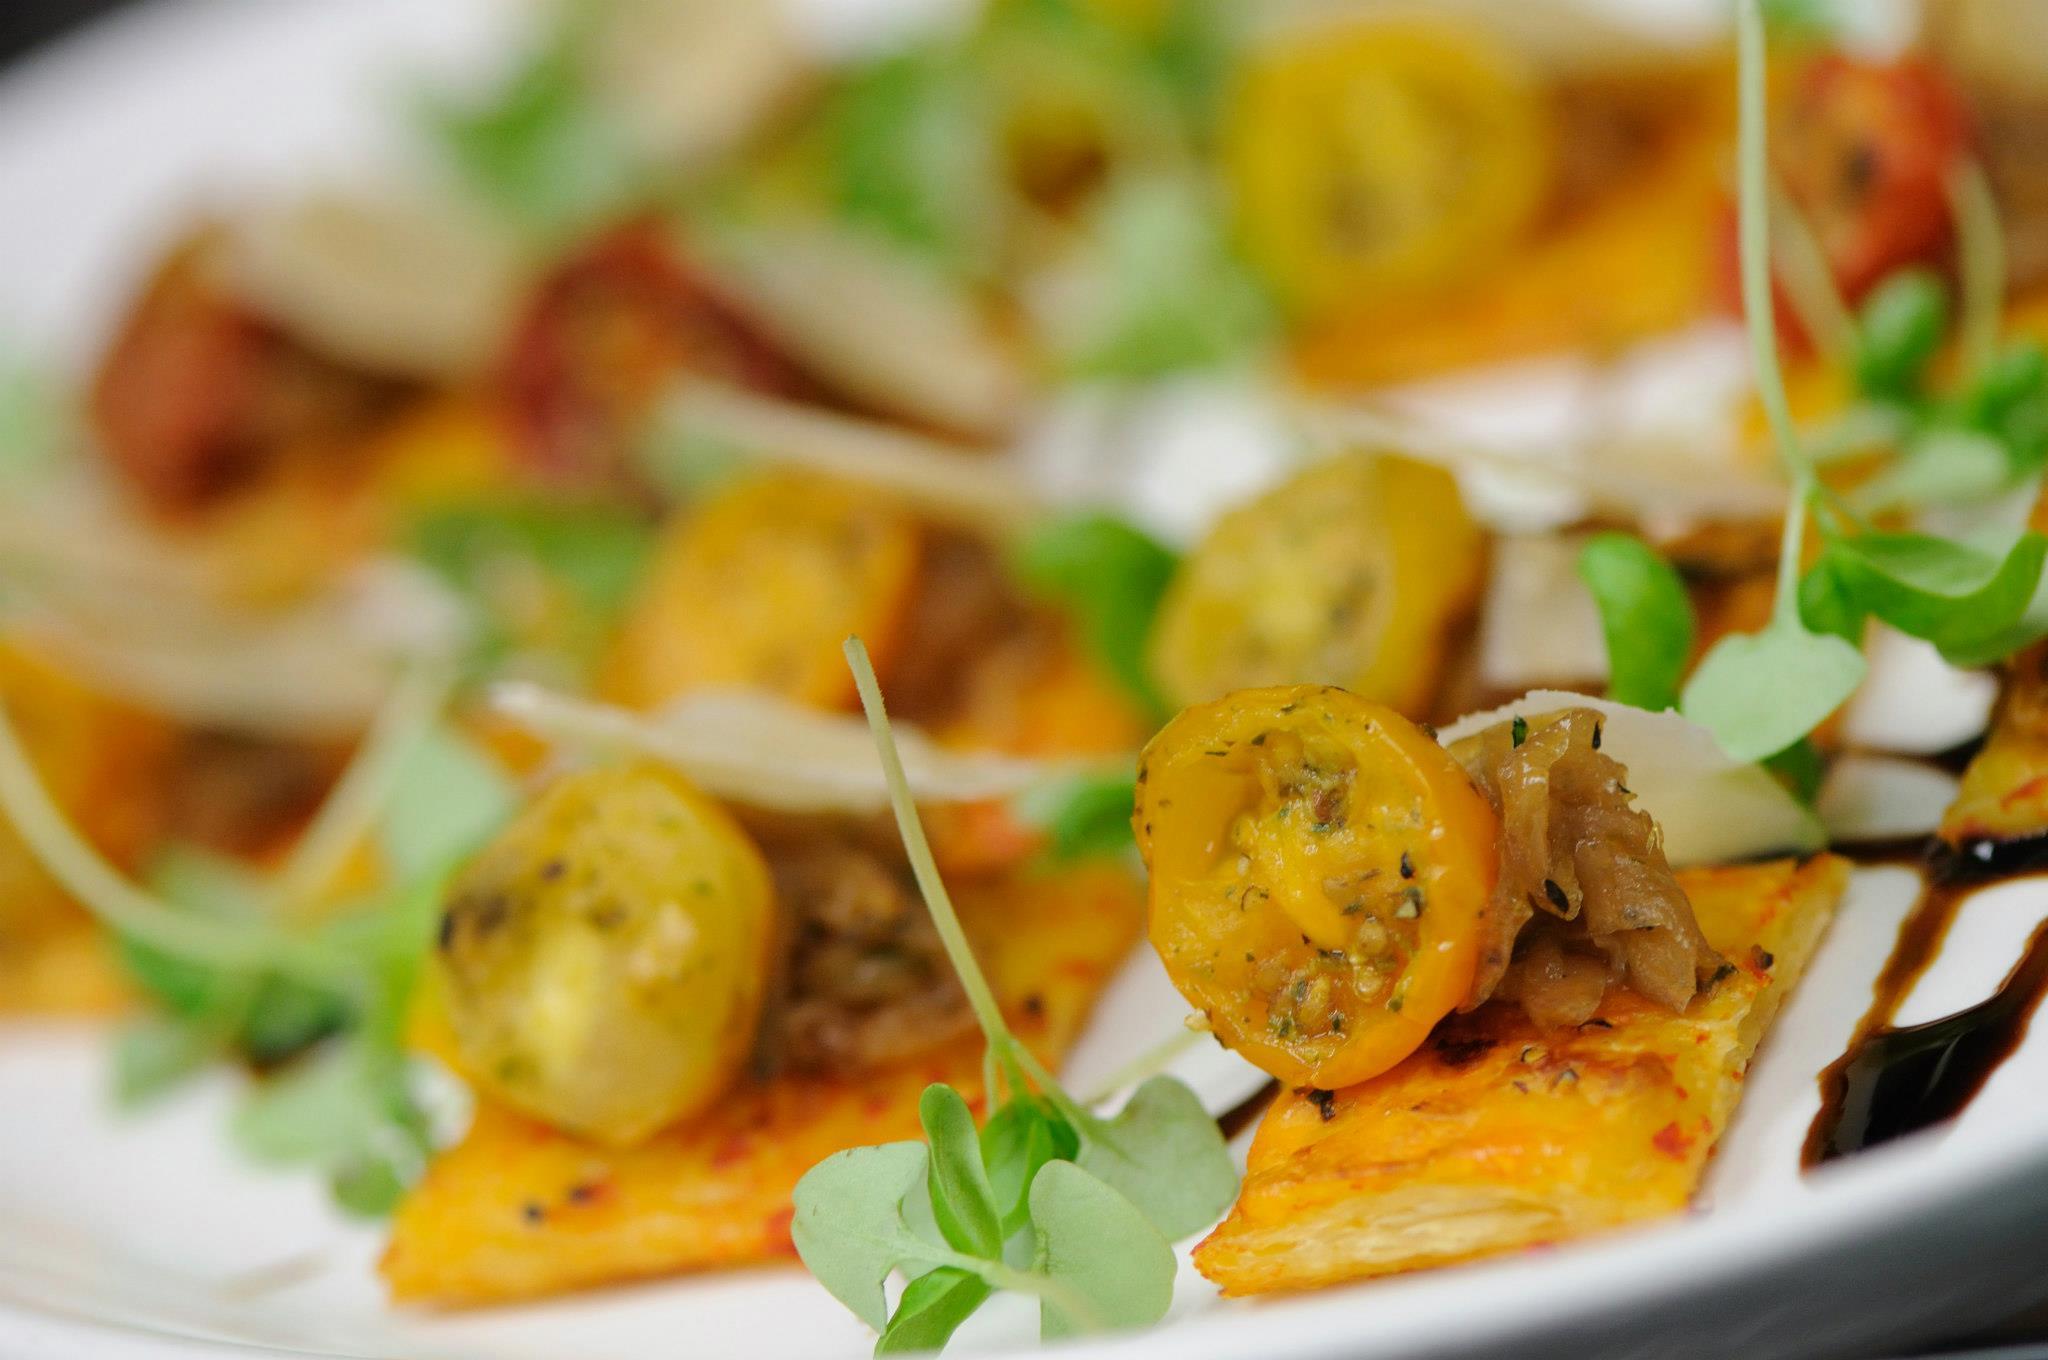 The popular Cucci Oakville restaurants signature dish on display with fresh tomotaoes